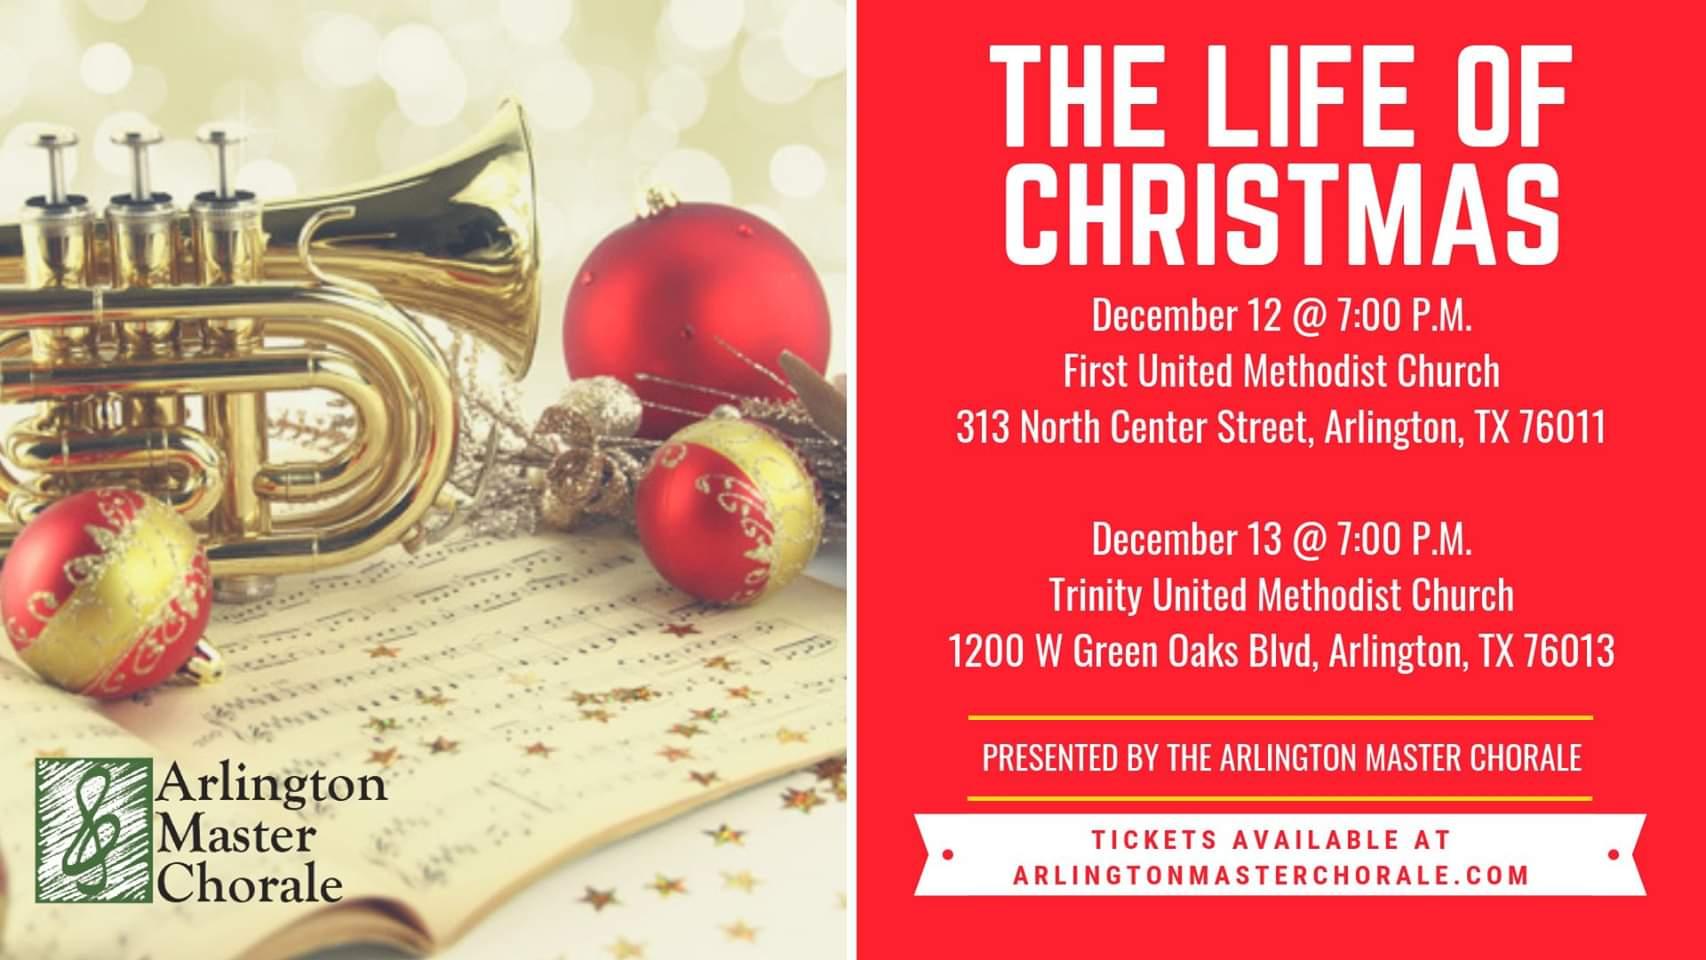 Trinity Methodist Church Arlington Tx Christmas Eve 2020 Arlington Master Chorale Presents a Winter Concert: The Life of